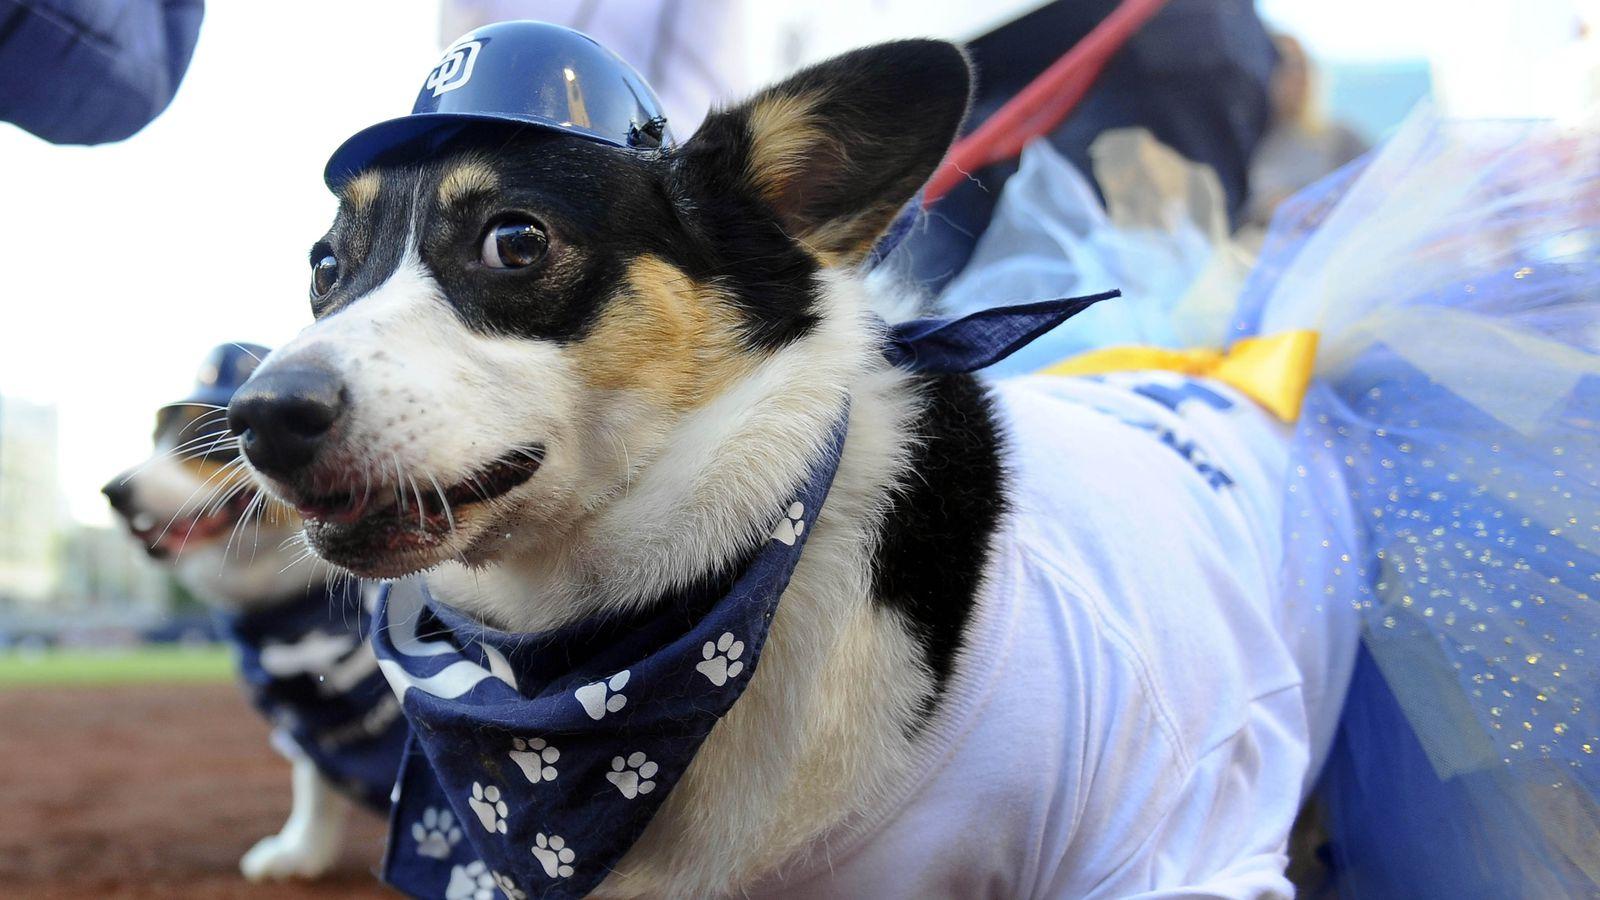 Dogs At Baseball Parks